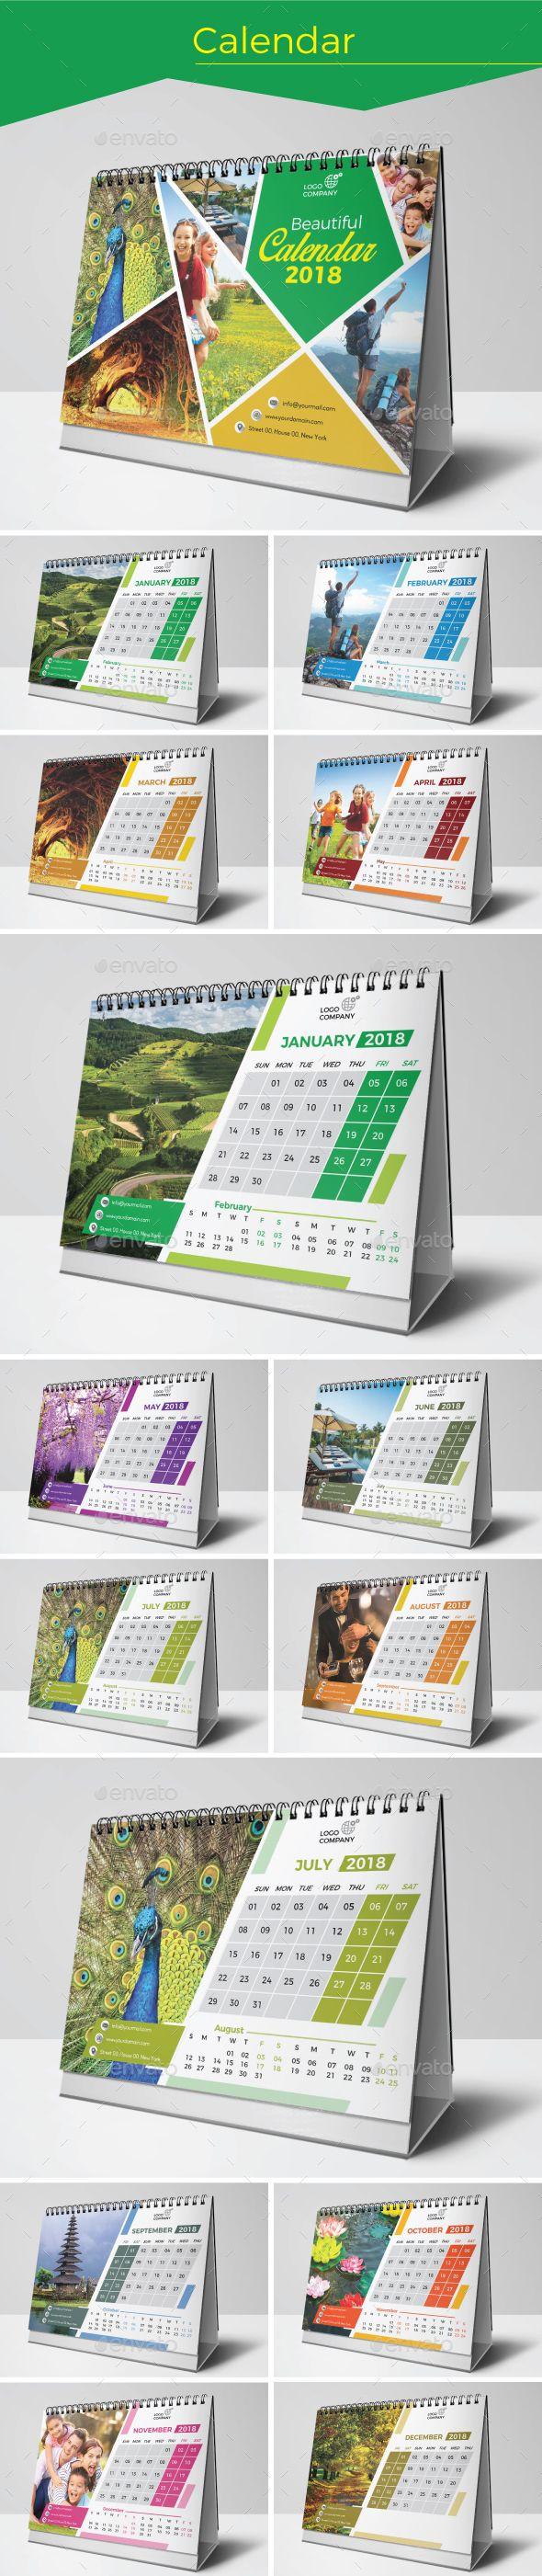 Calendar Template Vector EPS, AI Illustrator